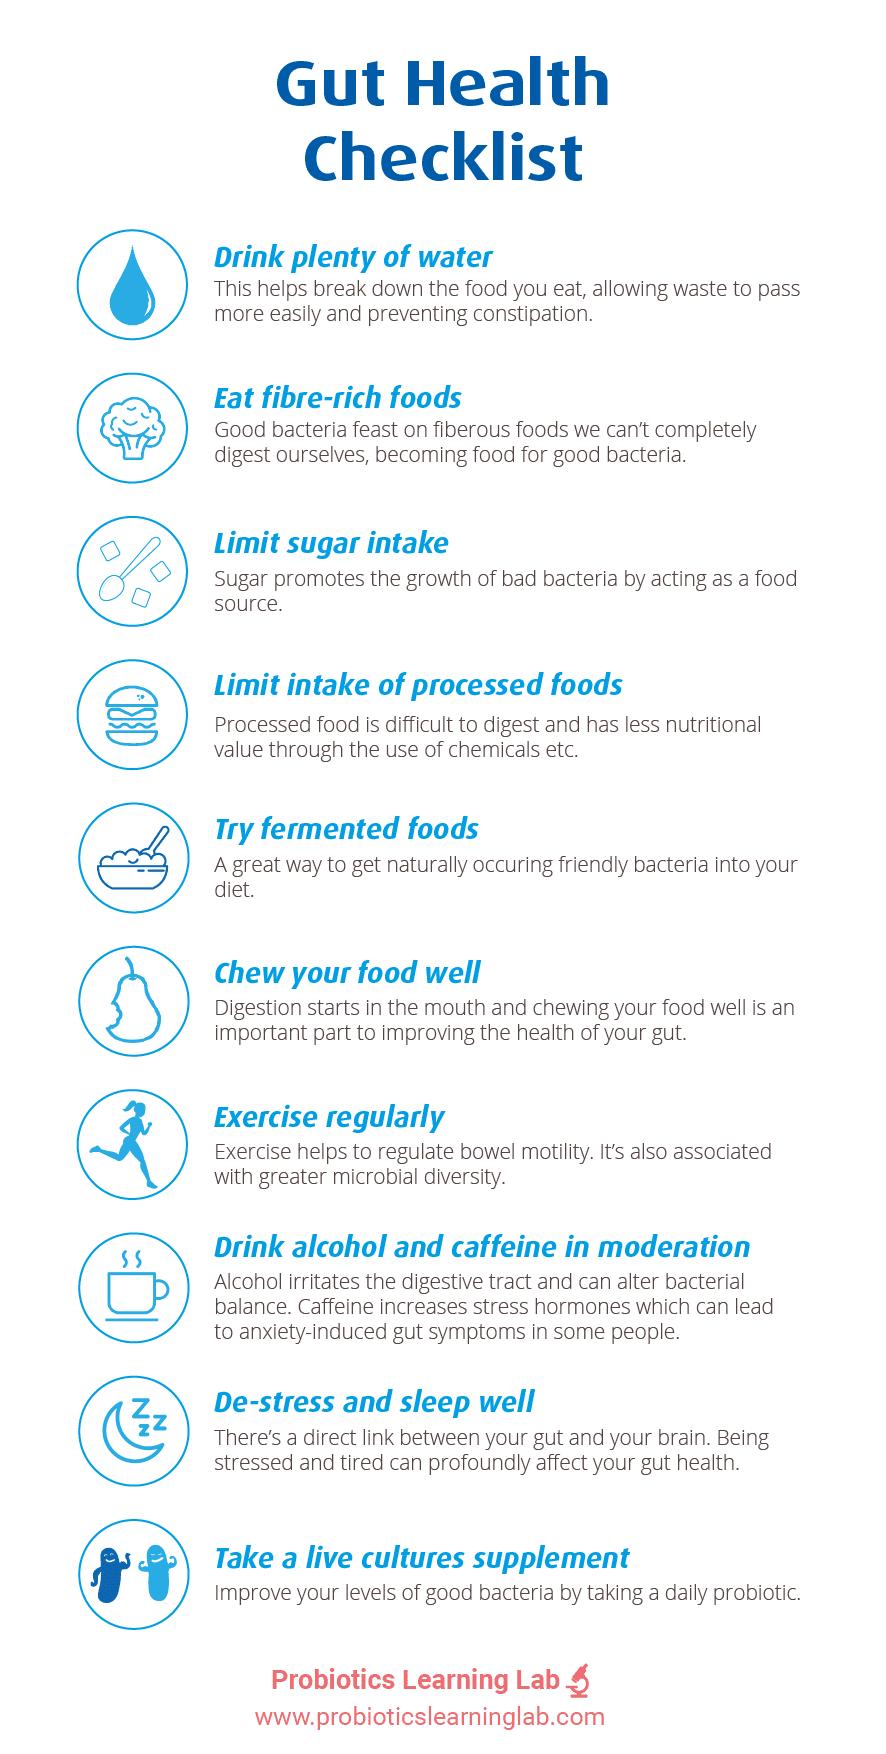 Gut health checklist | Probiotics Learning Lab